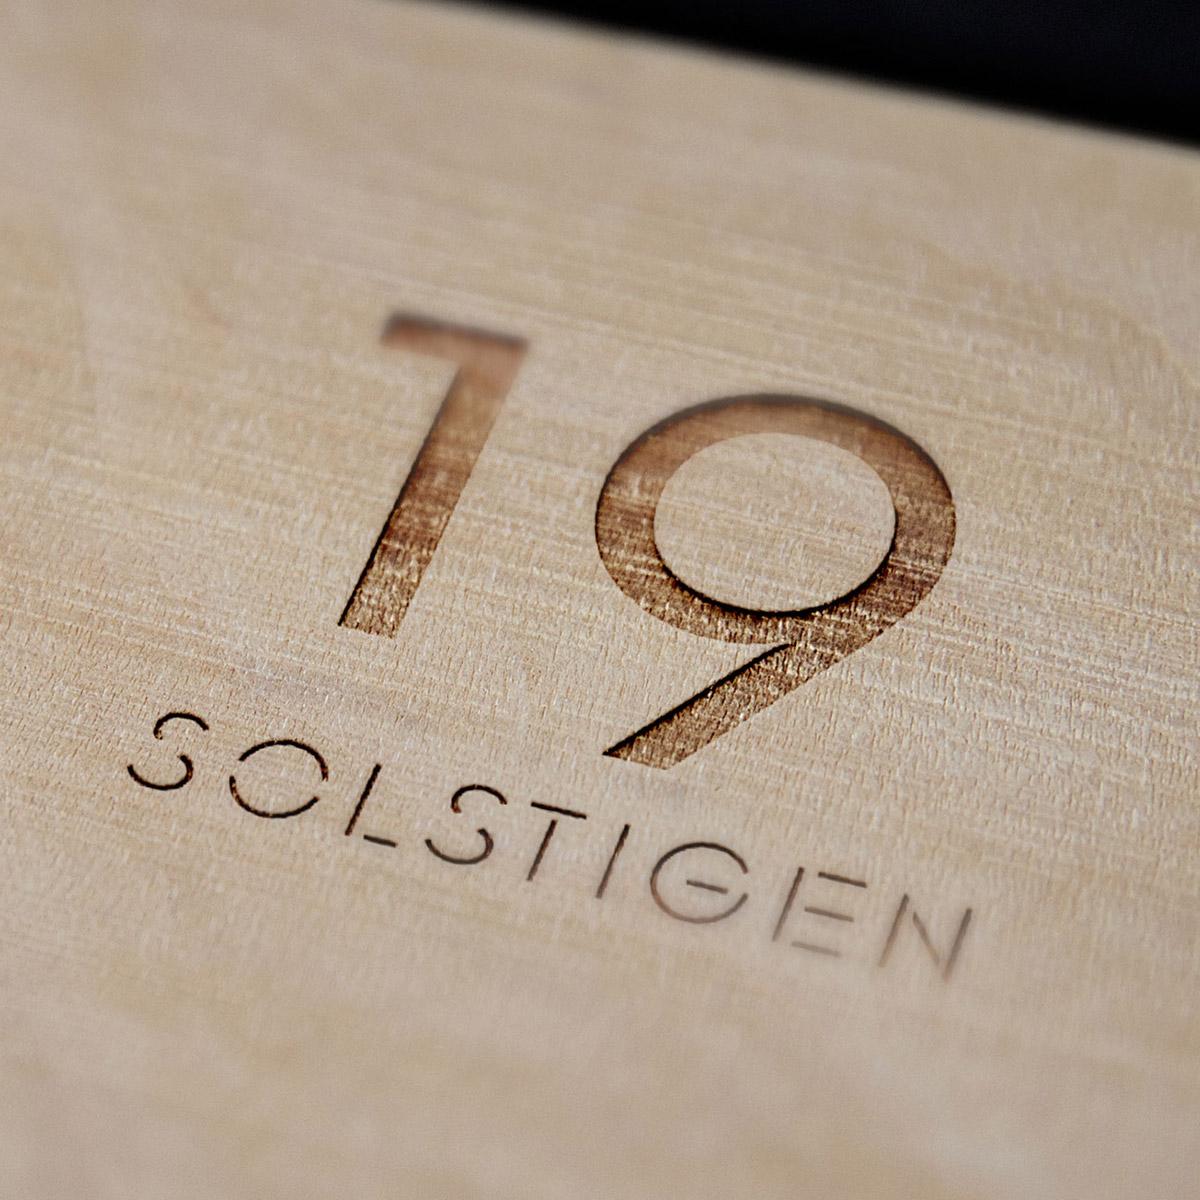 09_solstigen